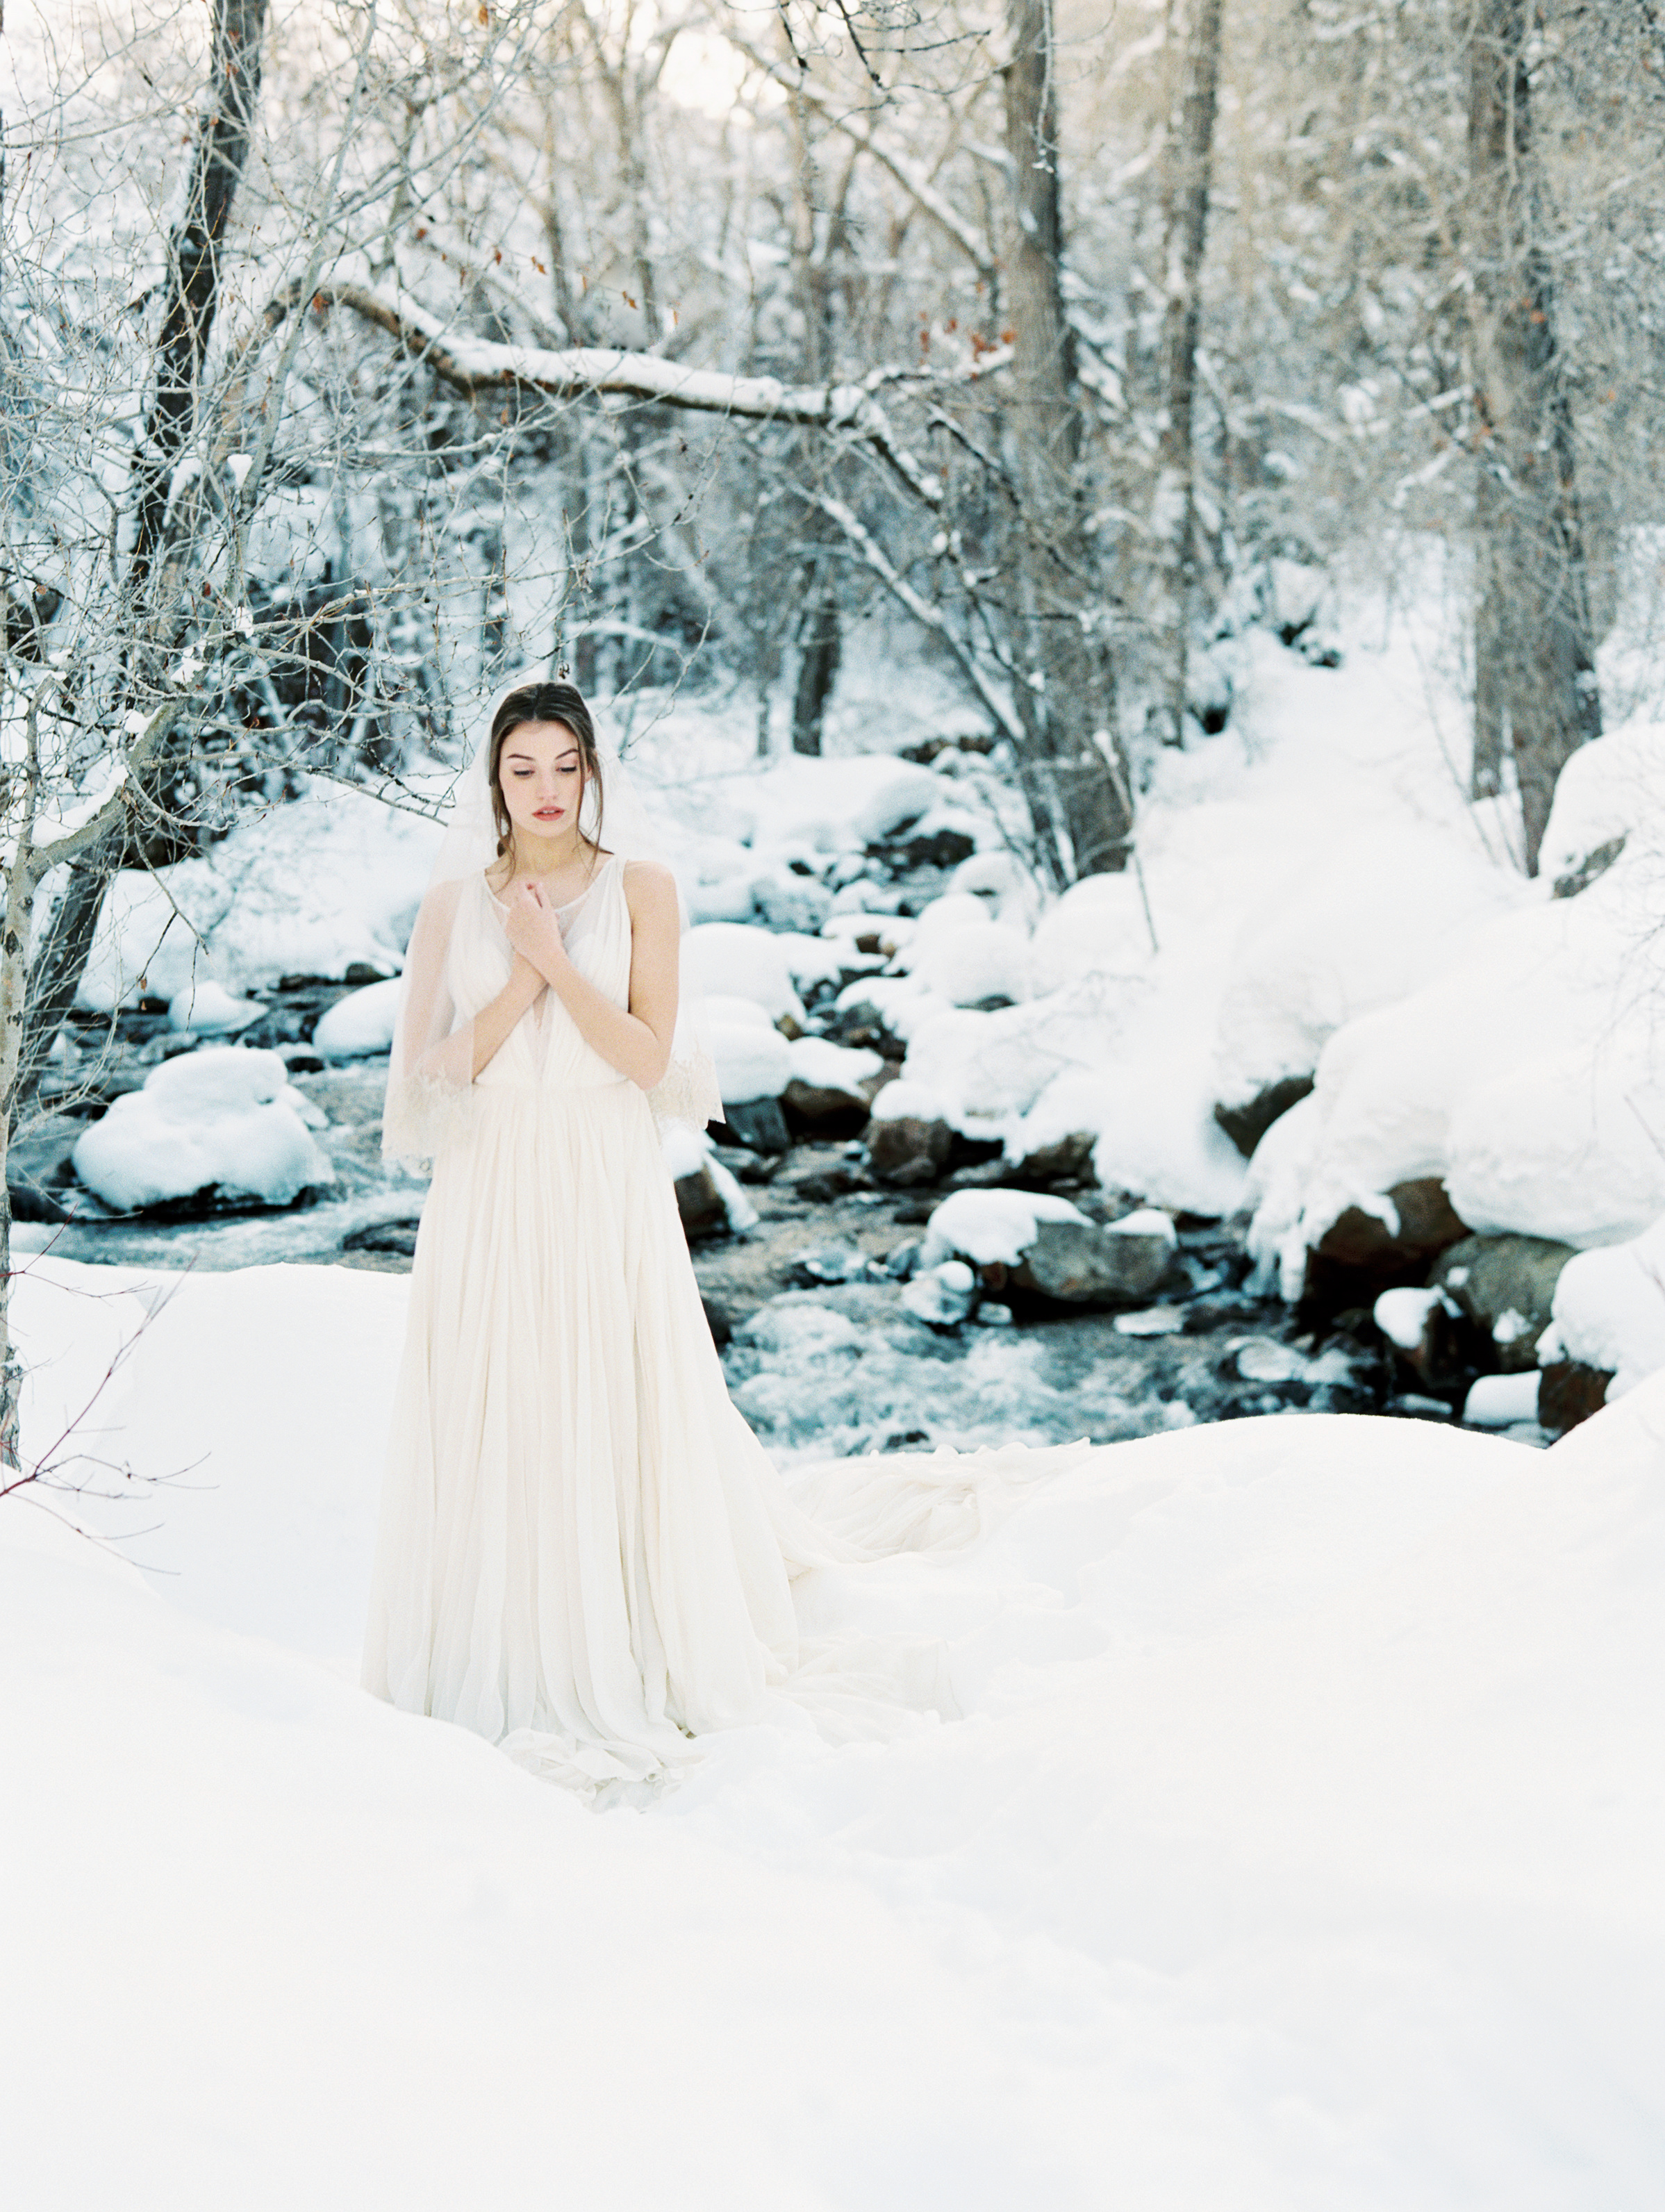 BellaCosa_WinterWonderland-116.jpg